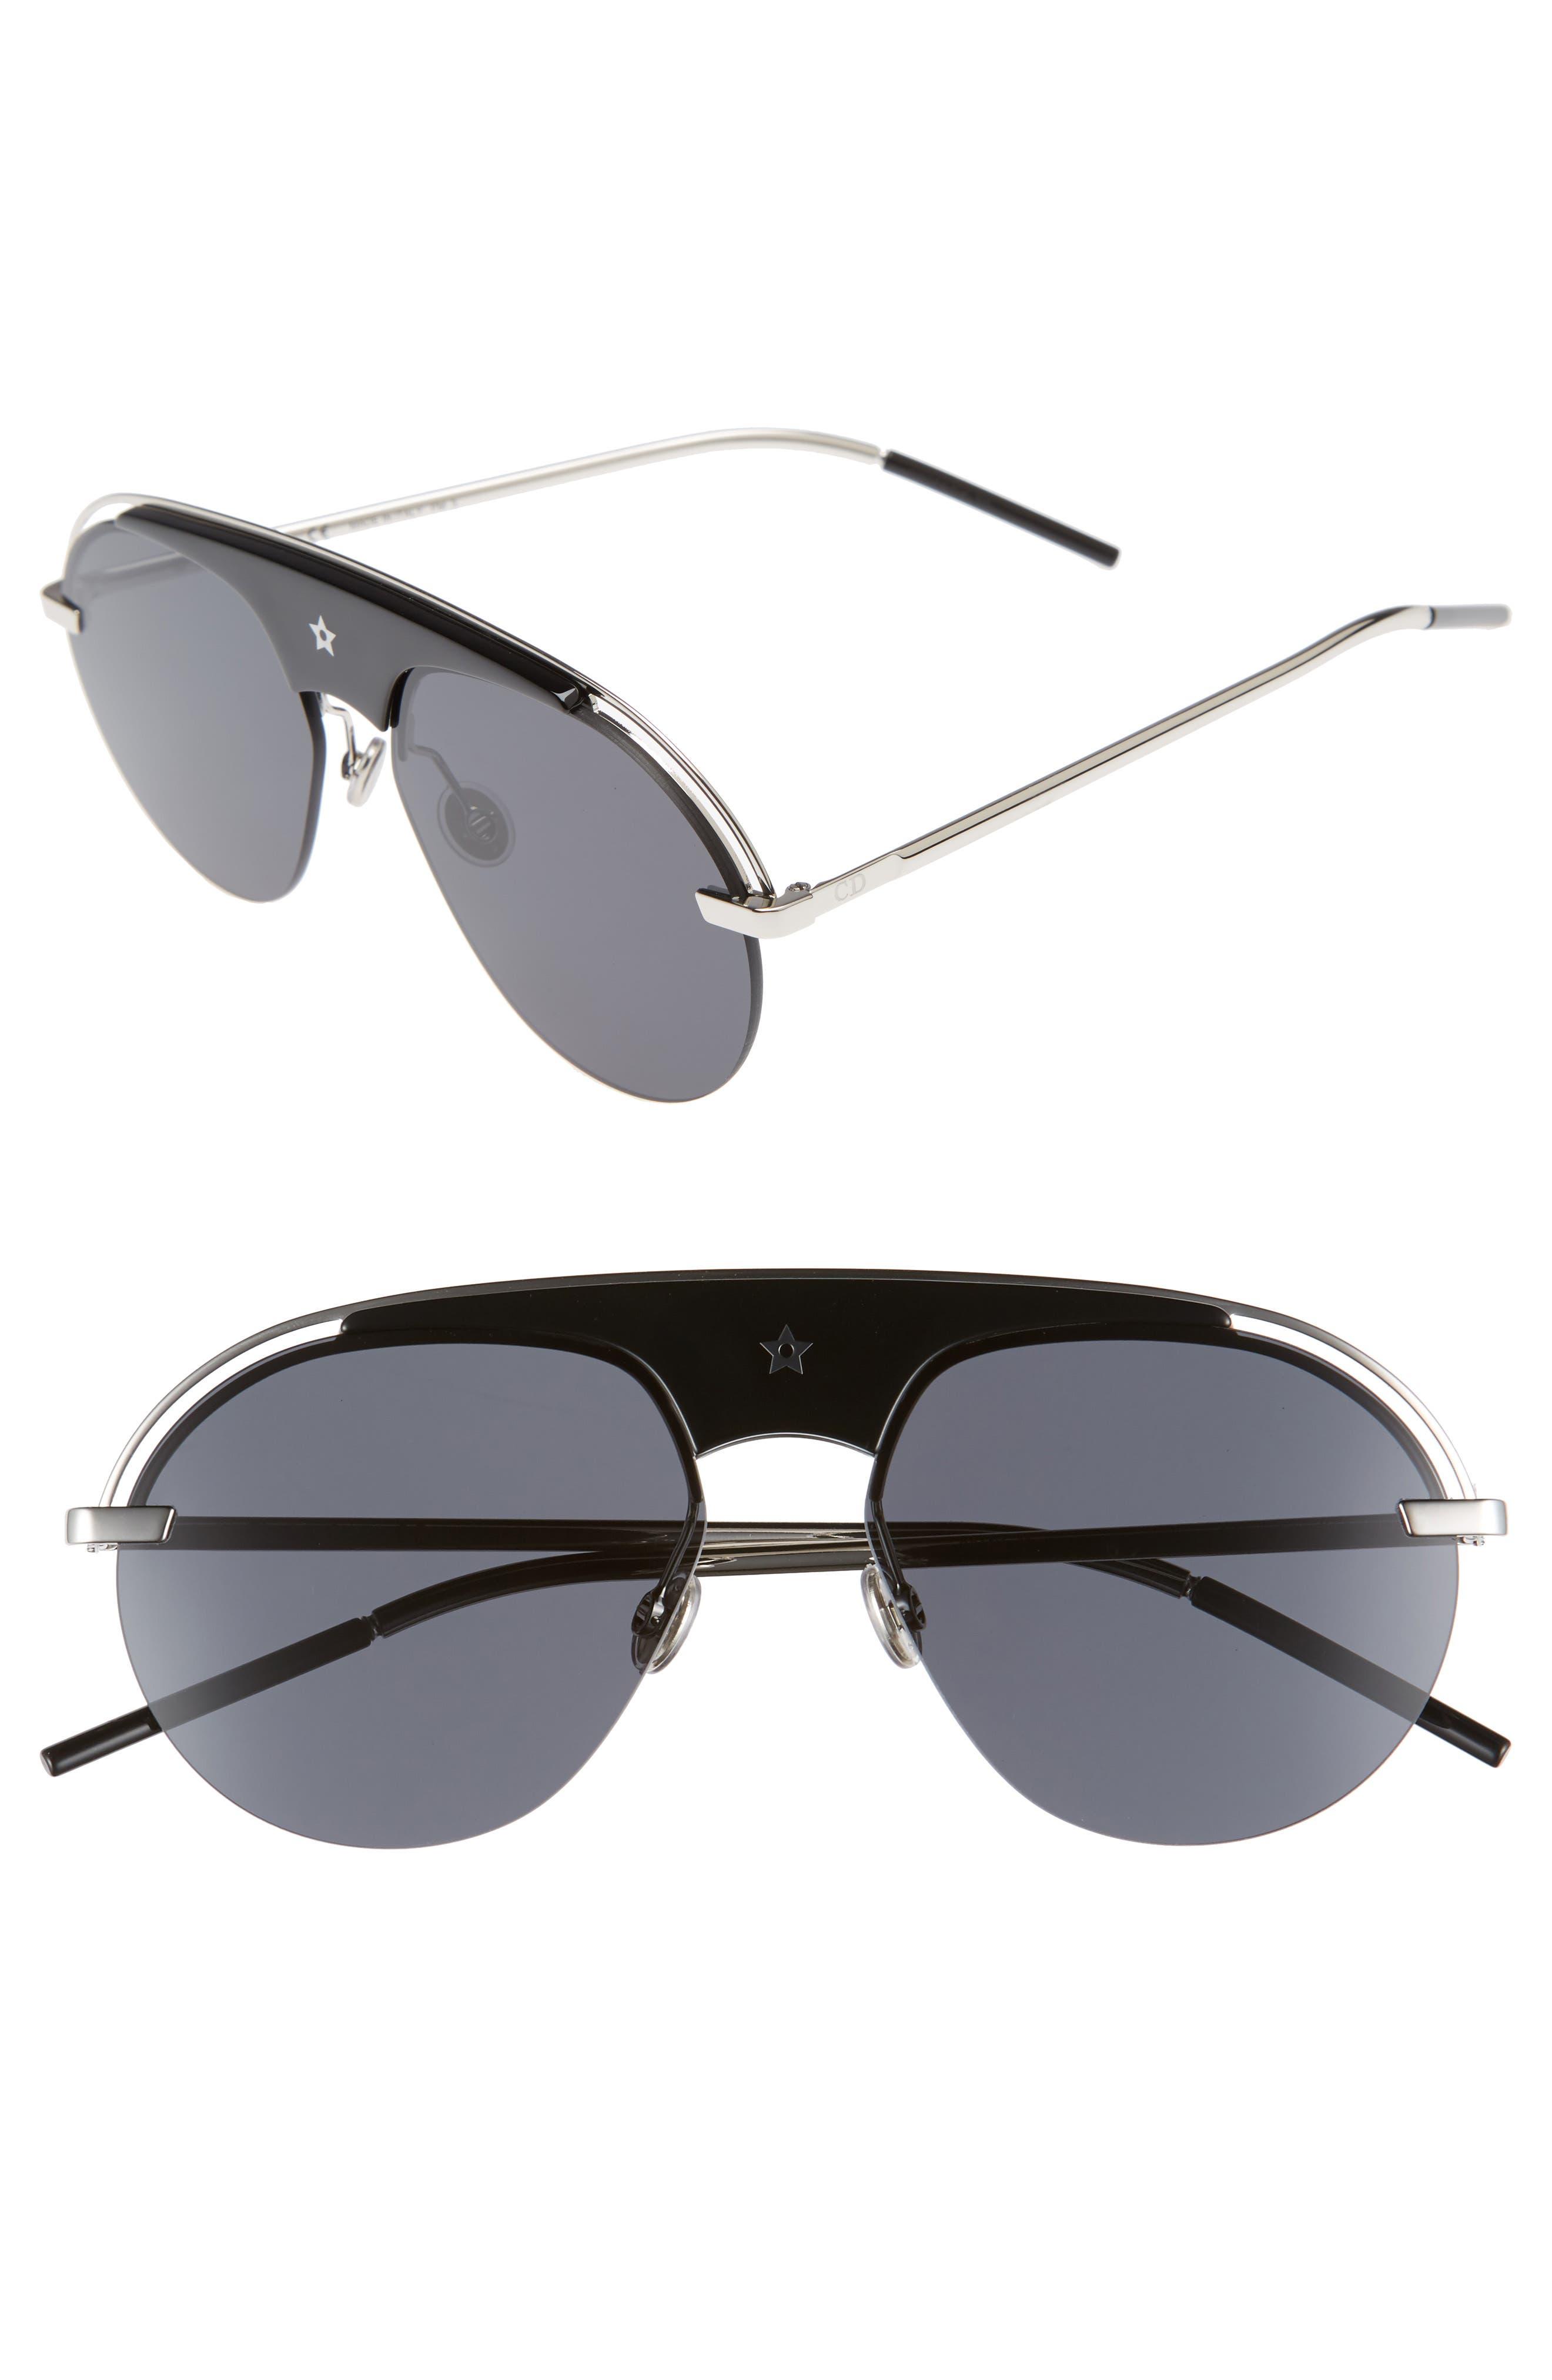 Revolution 58mm Aviator Sunglasses,                             Main thumbnail 1, color,                             001